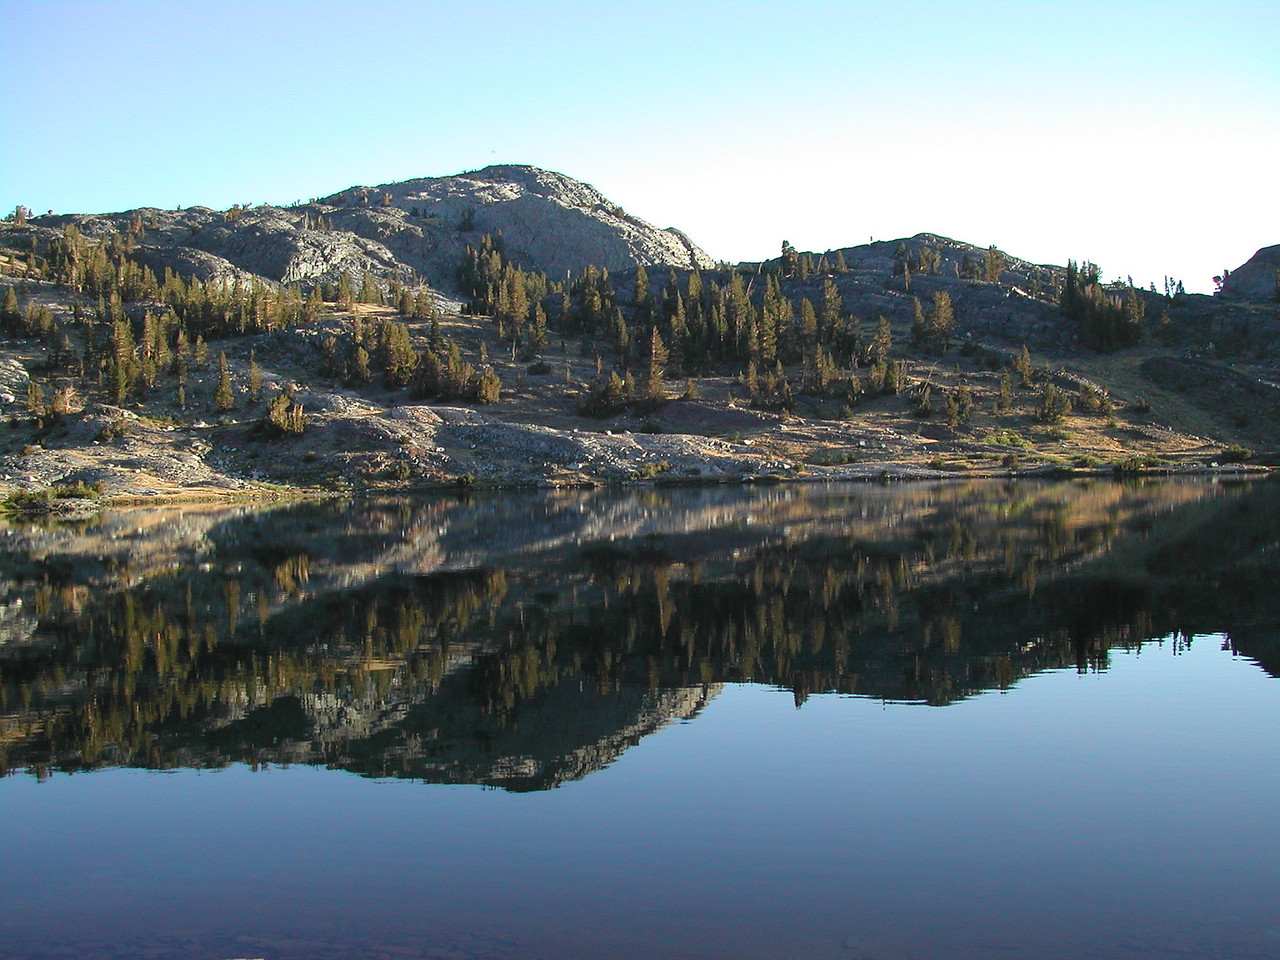 Morning: Thousand Island Lake 09-2002